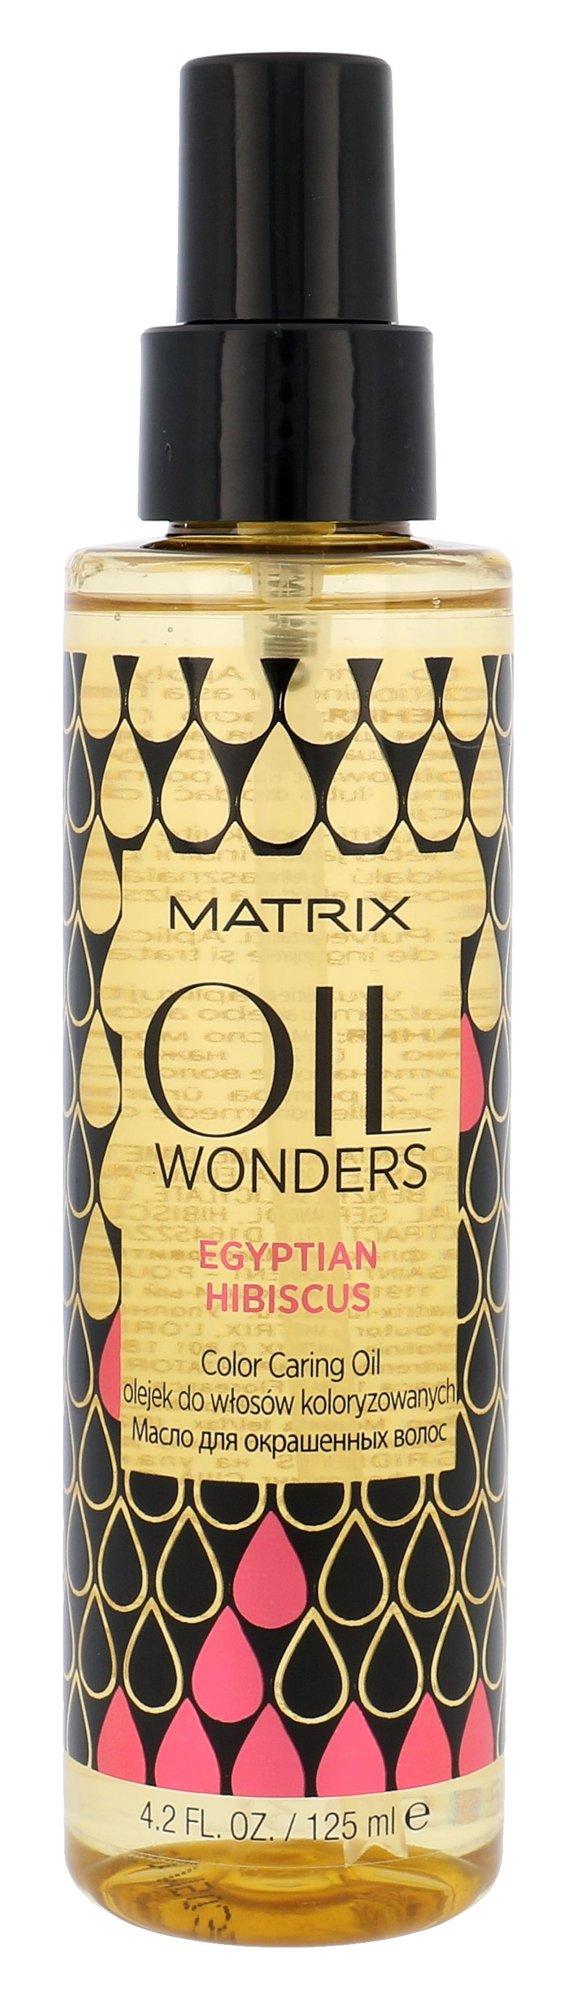 Matrix Oil Wonders Cosmetic 125ml